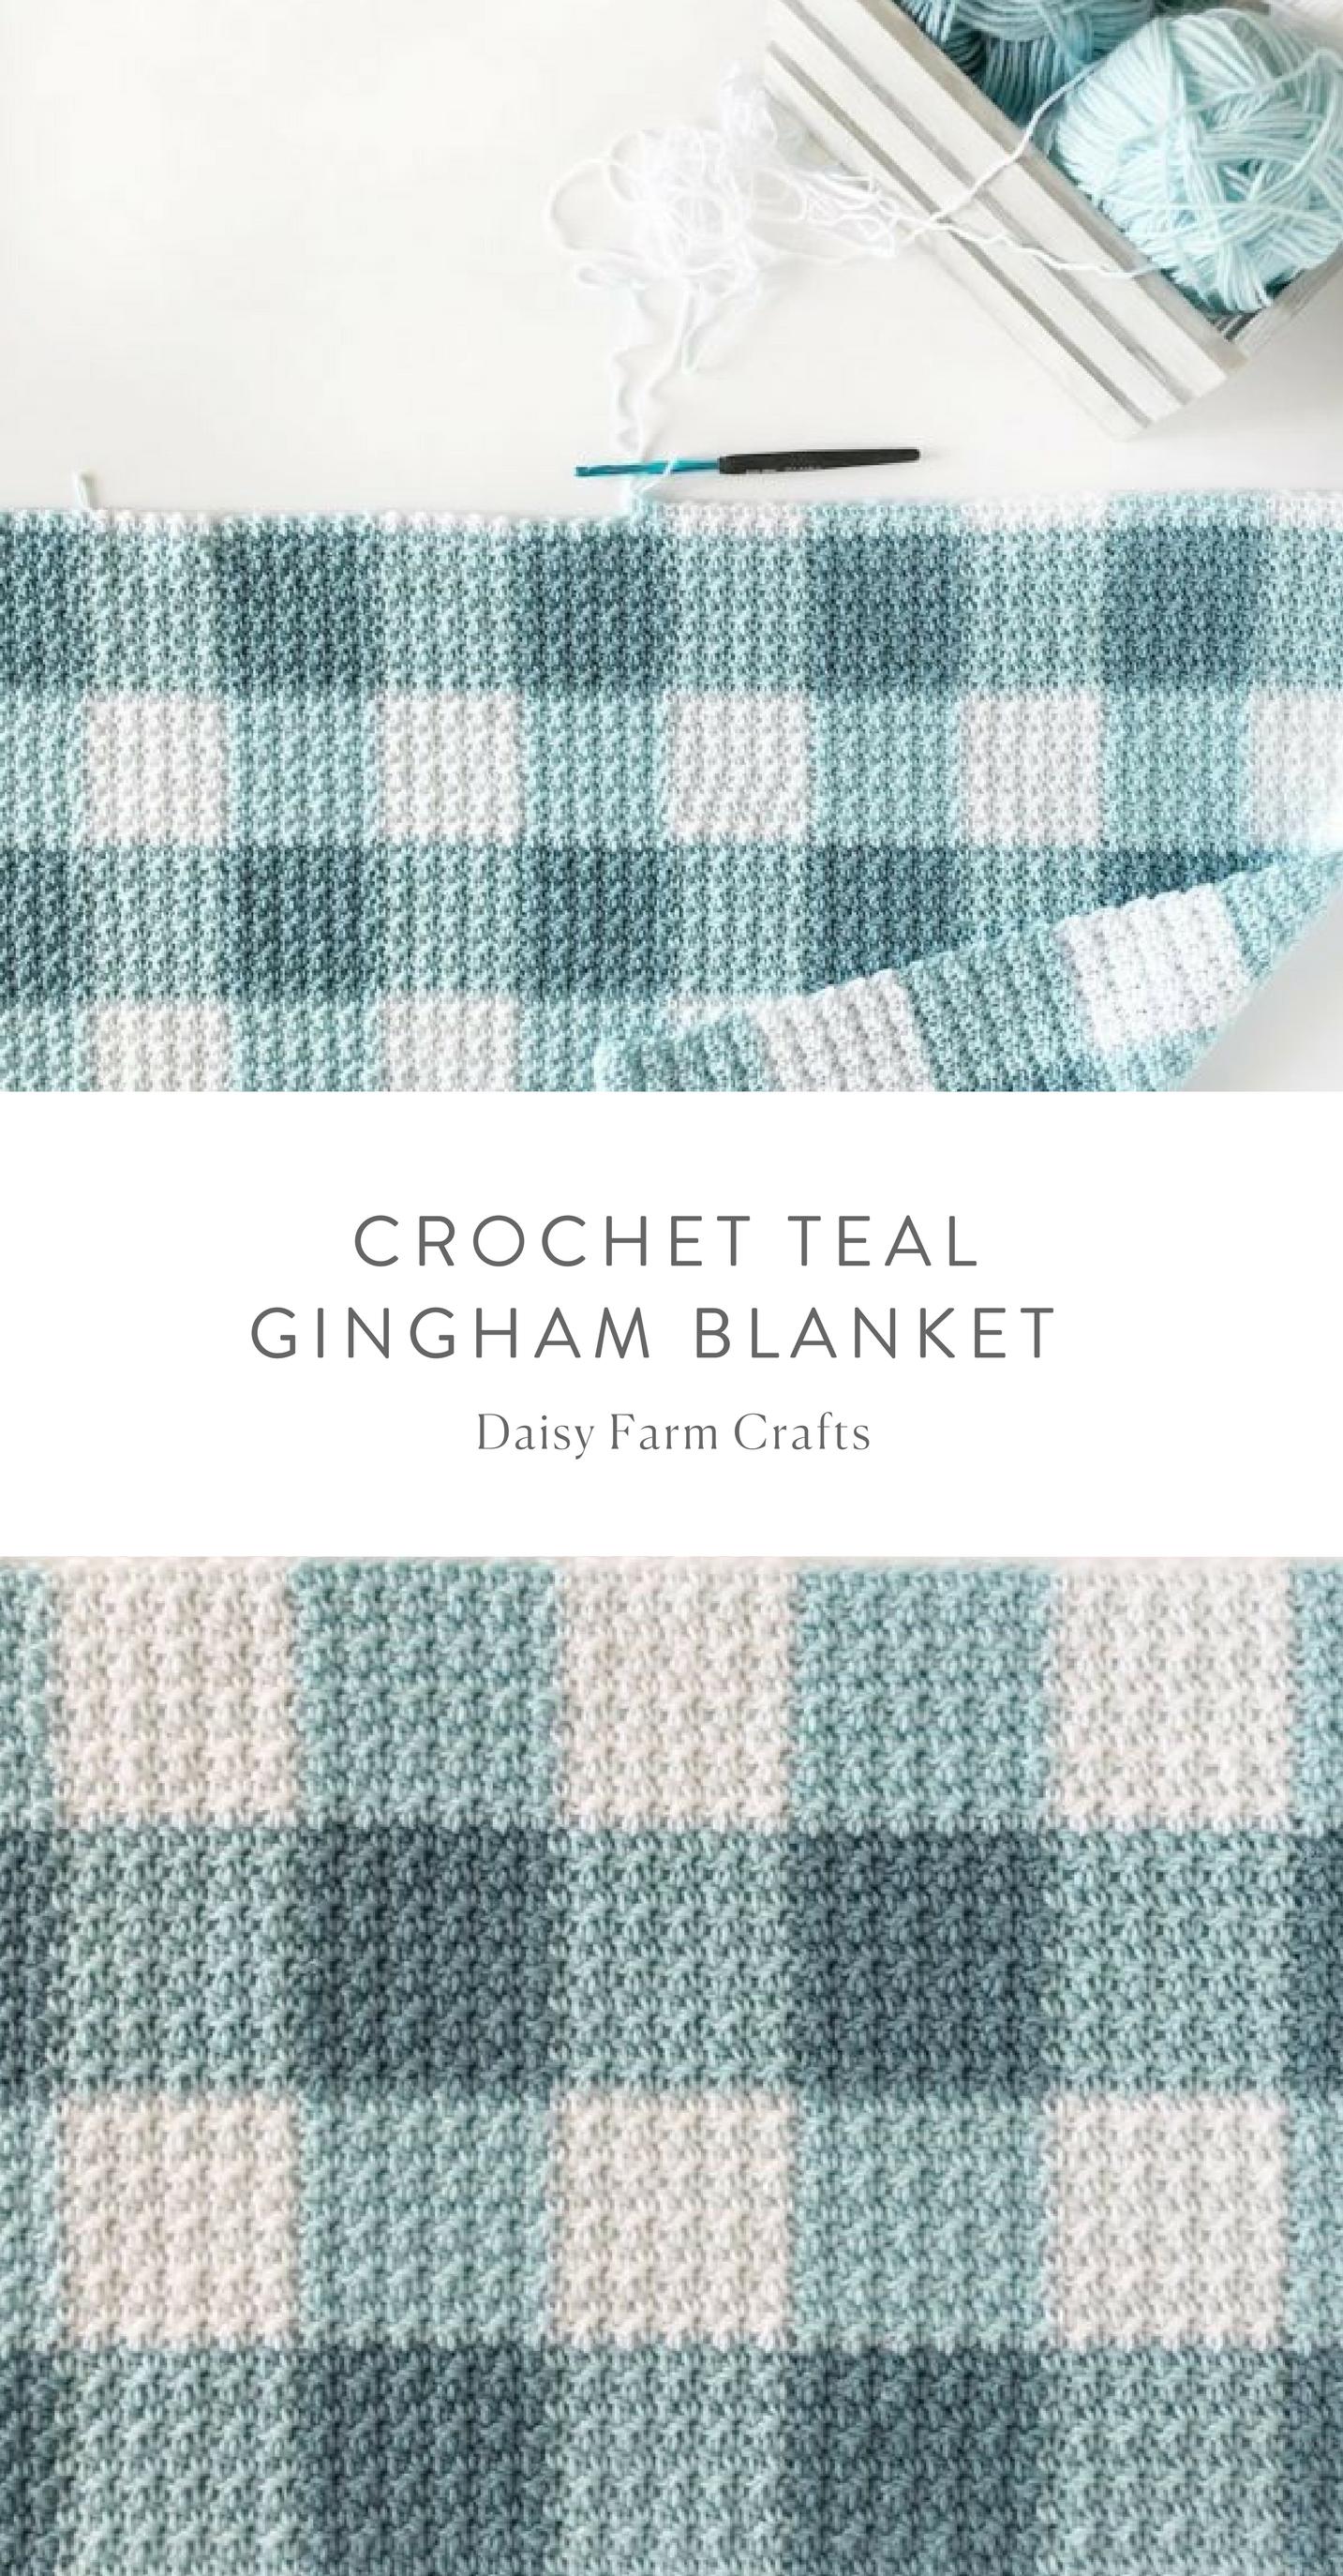 Free Pattern - Crochet Teal Gingham Blanket | soon | Pinterest ...